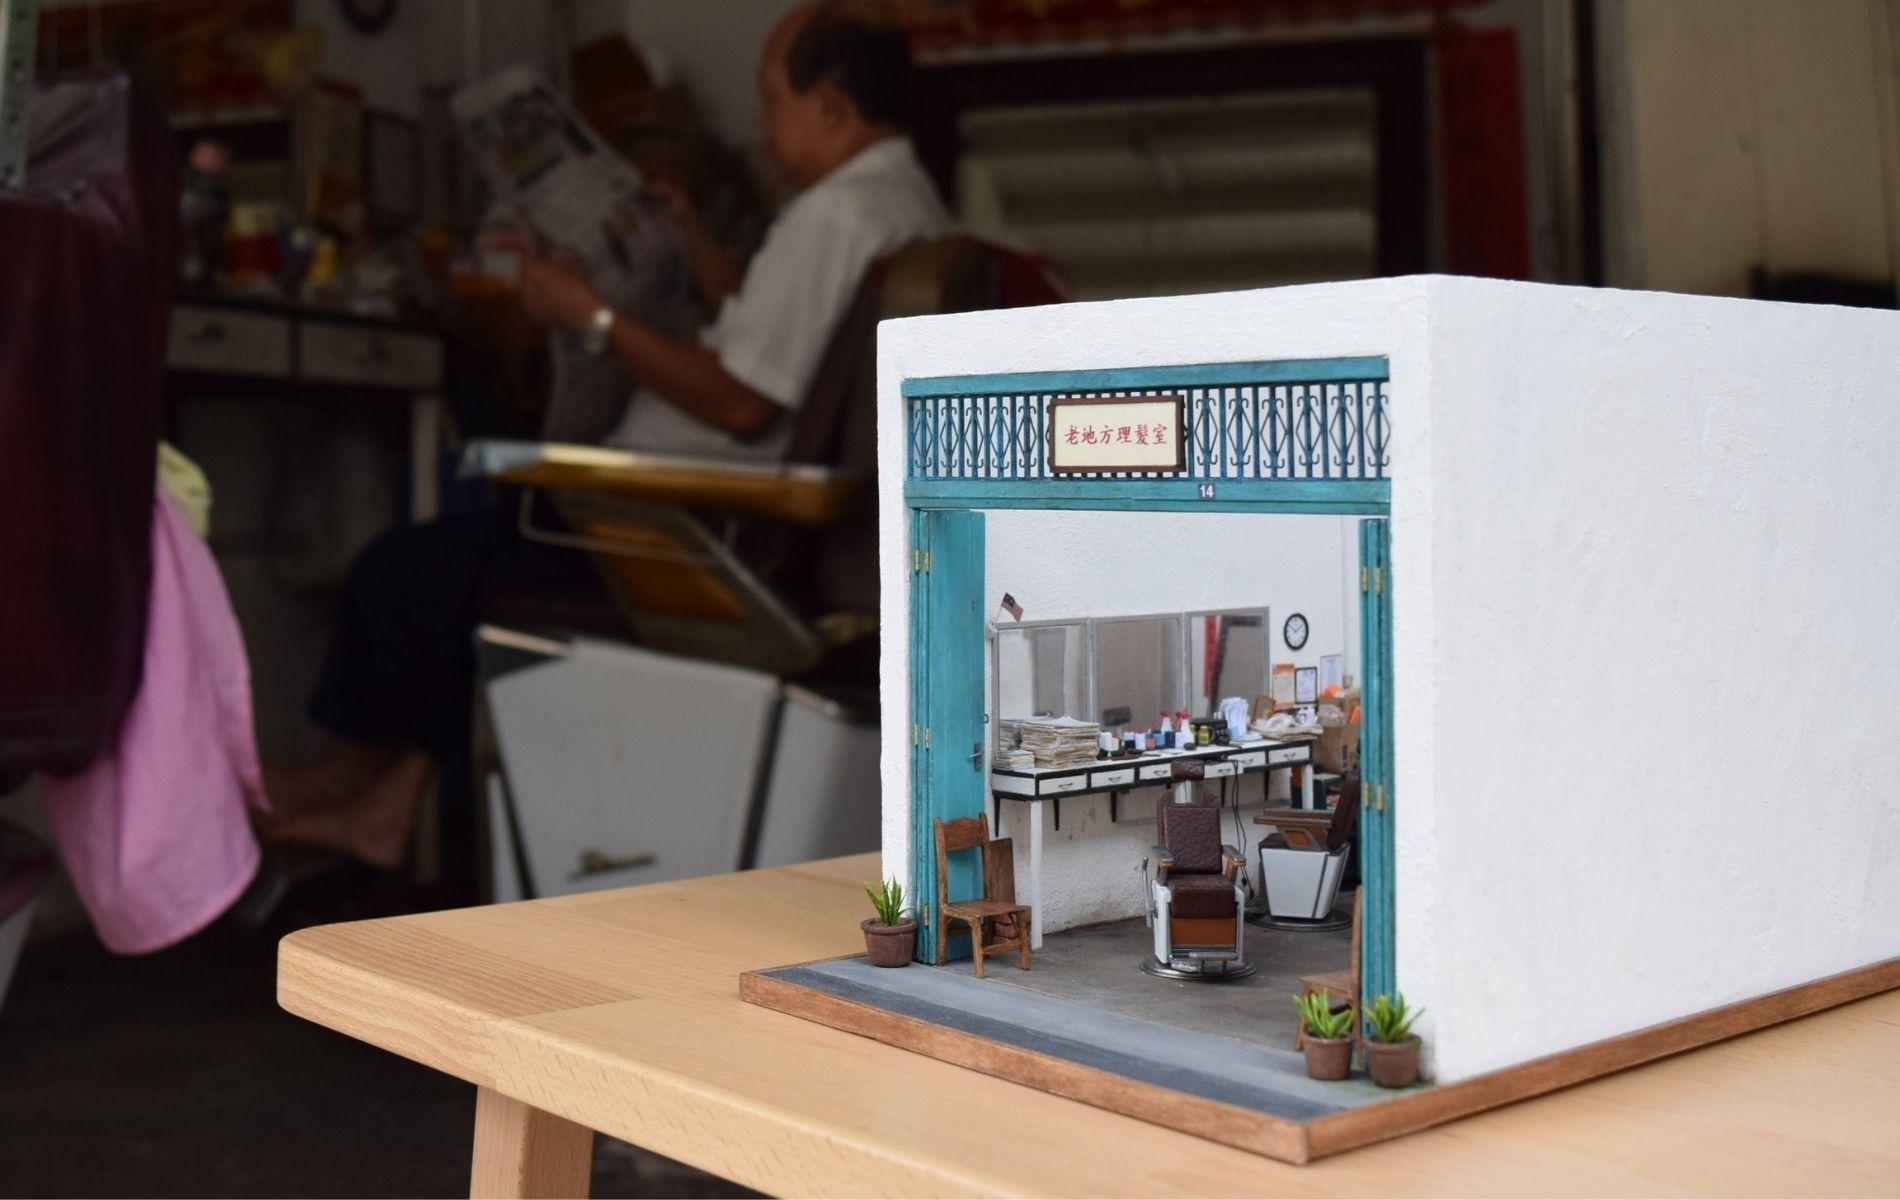 Artist Lim Pui Wan Creates Miniature Sculptures That Are Big On Nostalgic Charm